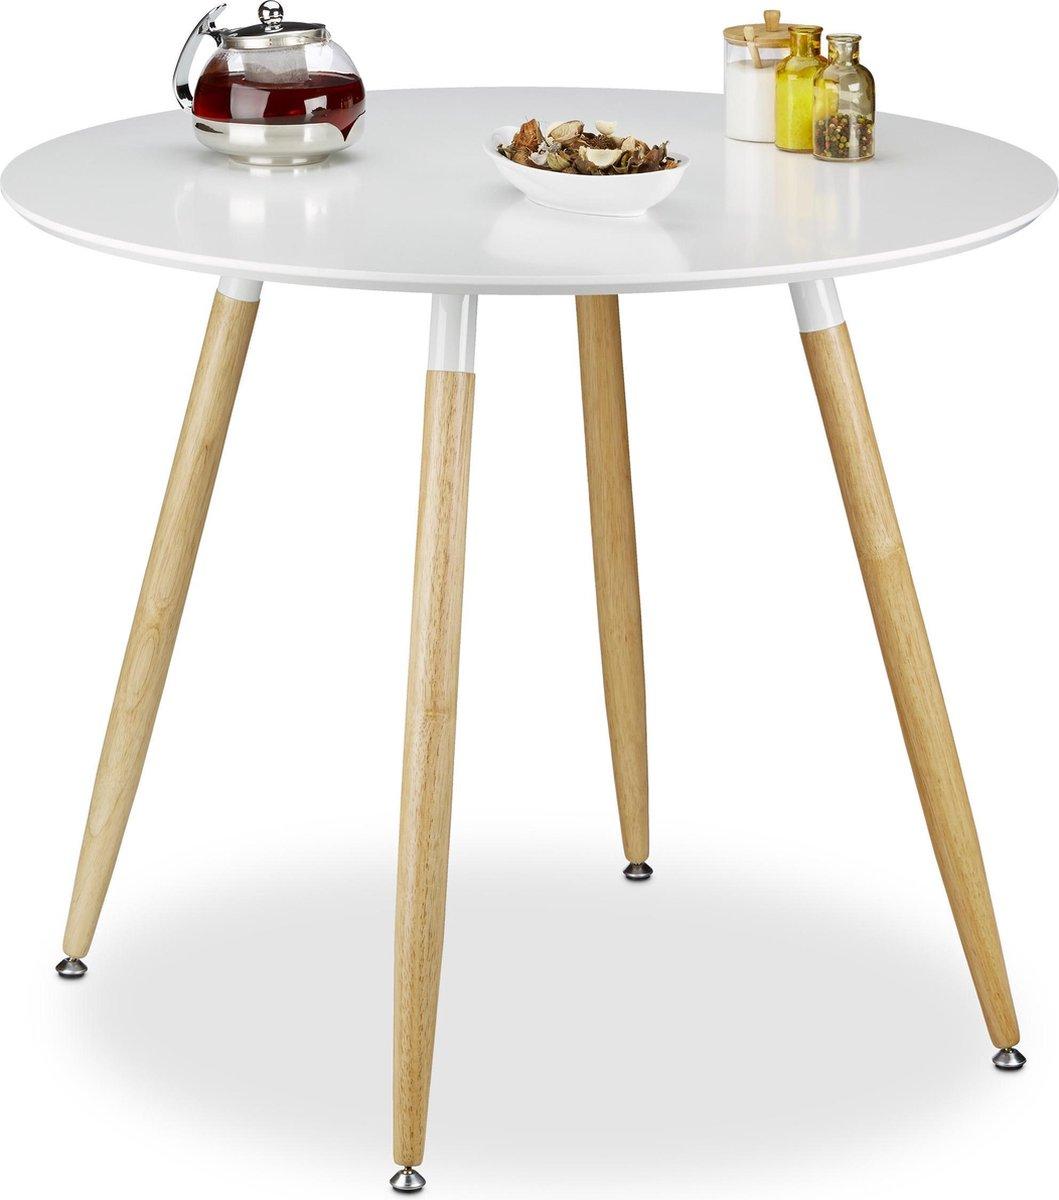 Wonderlijk bol.com   relaxdays - eettafel rond - eetkamertafel - eetkamer DH-17